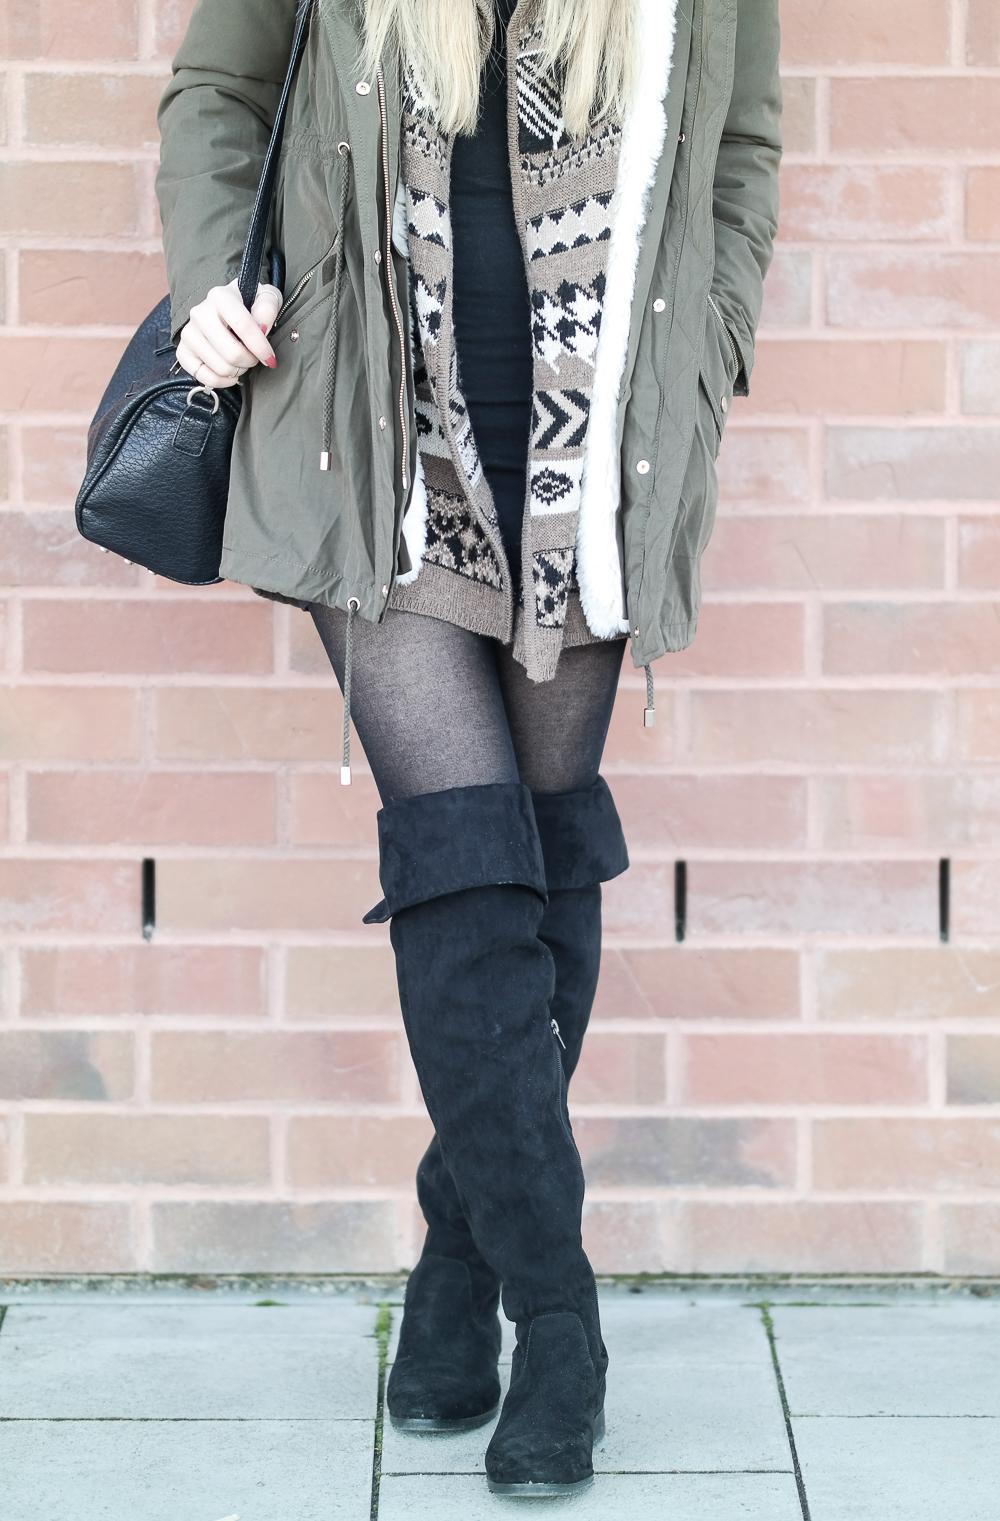 94188bb78dca97 TheRubinRose-Aztekenmuster Cardigan-Modeblog München-Fashionblog  München-Modeblogger-Fashionblogger-Aztekenmuster